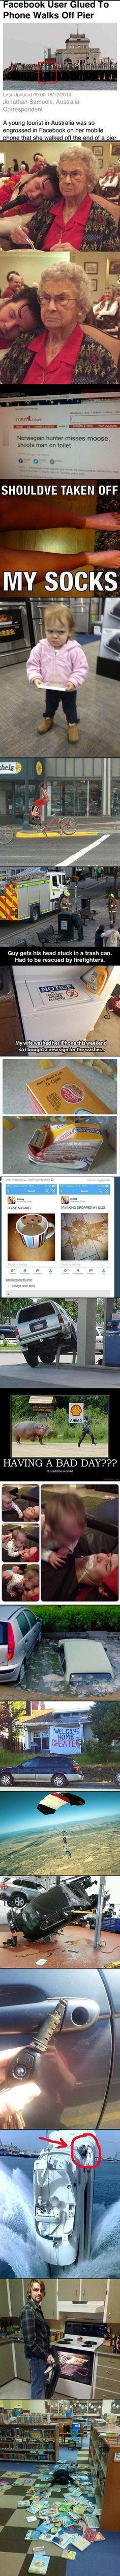 Lol - funny as hell bestfunnyjokes4u.com/